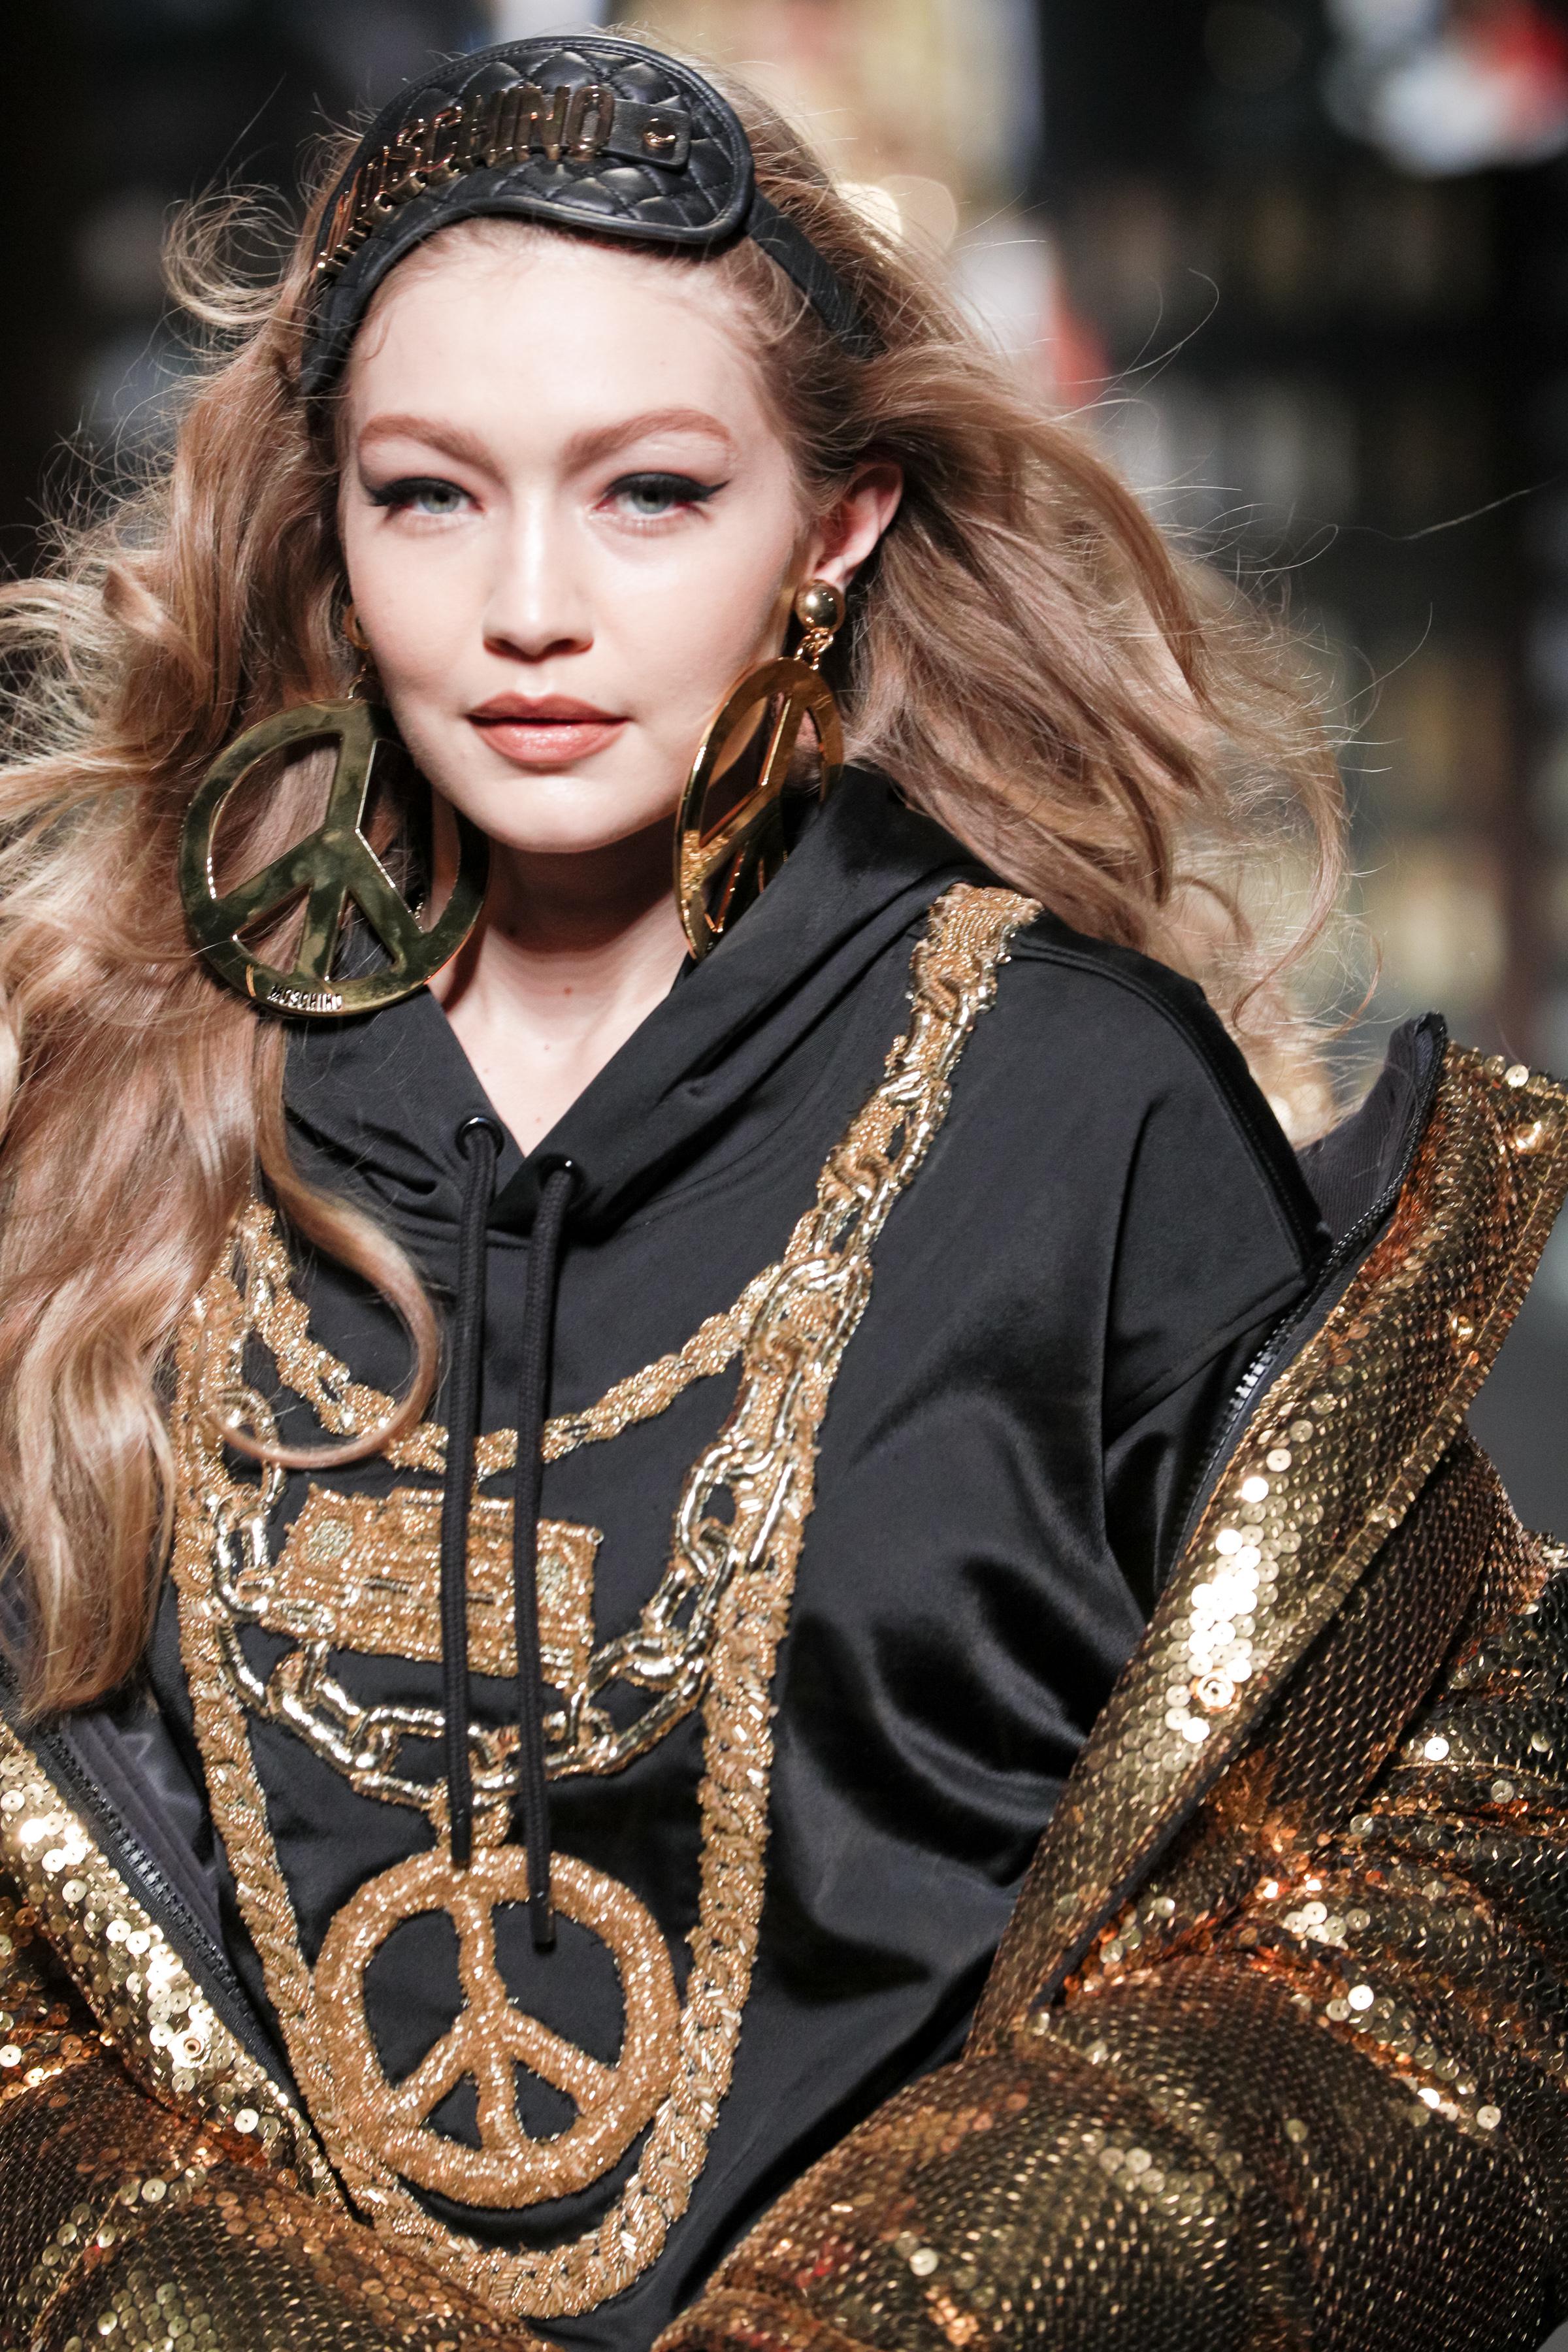 MOSCHINO [tv] H&M Holiday 2018 Fashion Show by Jeremy Scott